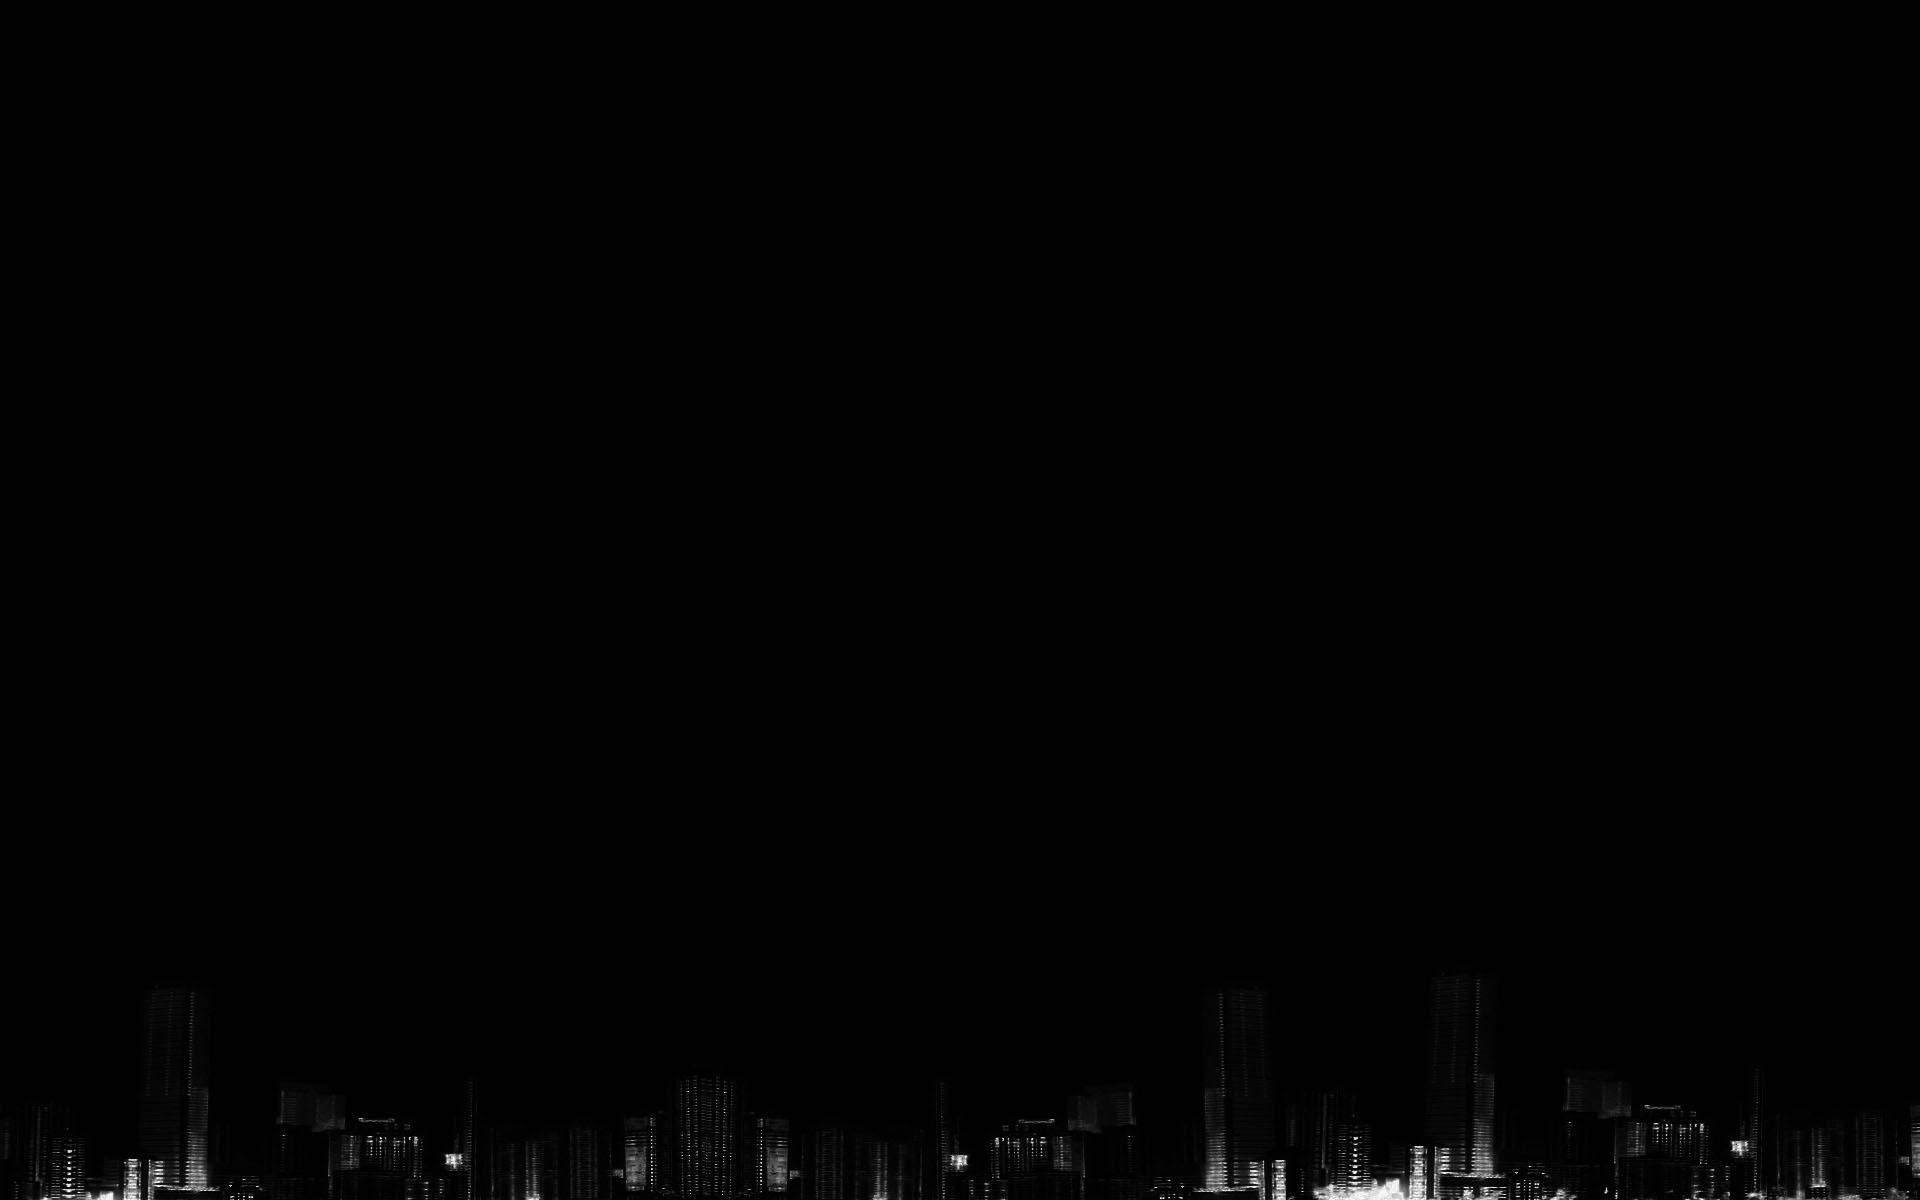 wallpapers mac abstract desktop background apple black wildlife 1920x1200